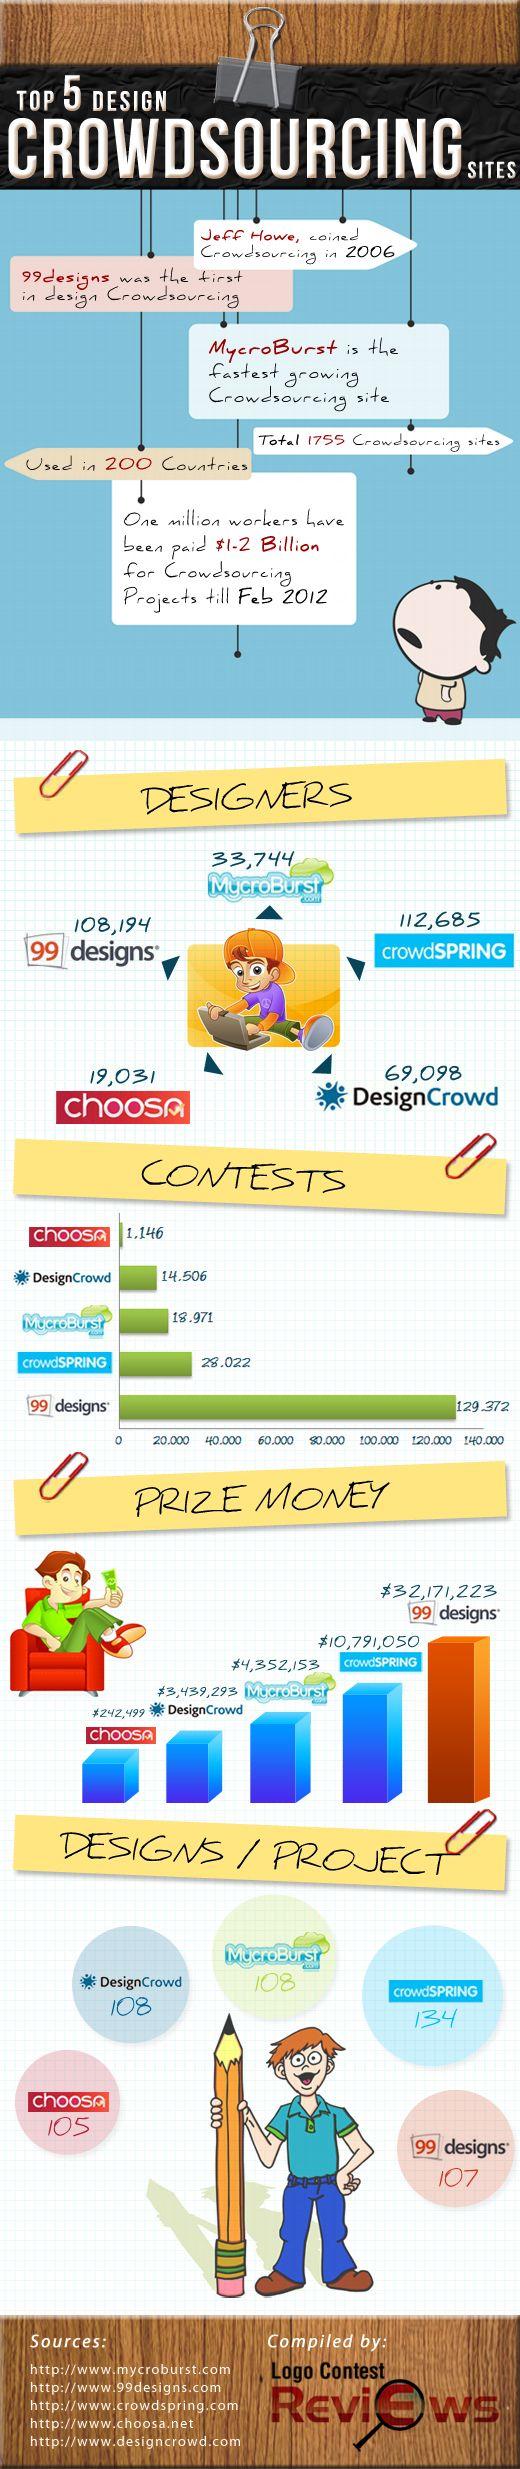 Top 5 Design Crowdsourcing SitesDesign Crowdsourcing, Design Infographic, Website, Social Media, Crowdsourcing Site, Site Infographic, Crowdfunding Infographic, Crowdsourcing Infographic, Crowdsourcing Education